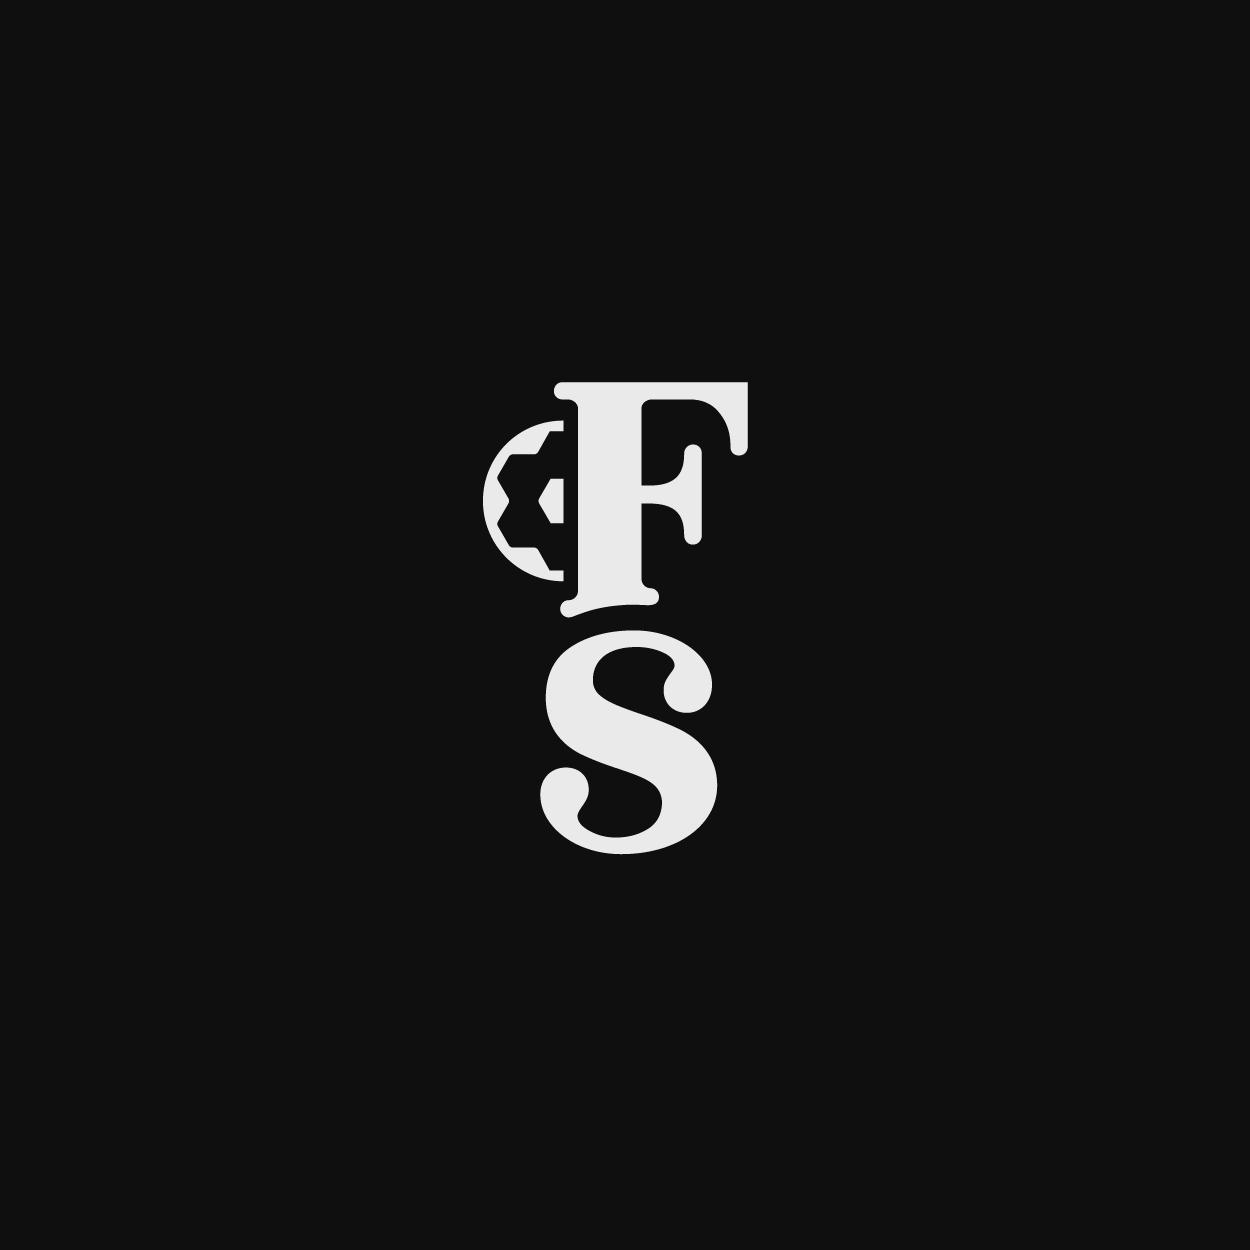 Sylvan_Logofolio2019_Artboard 106 copy1250.jpg